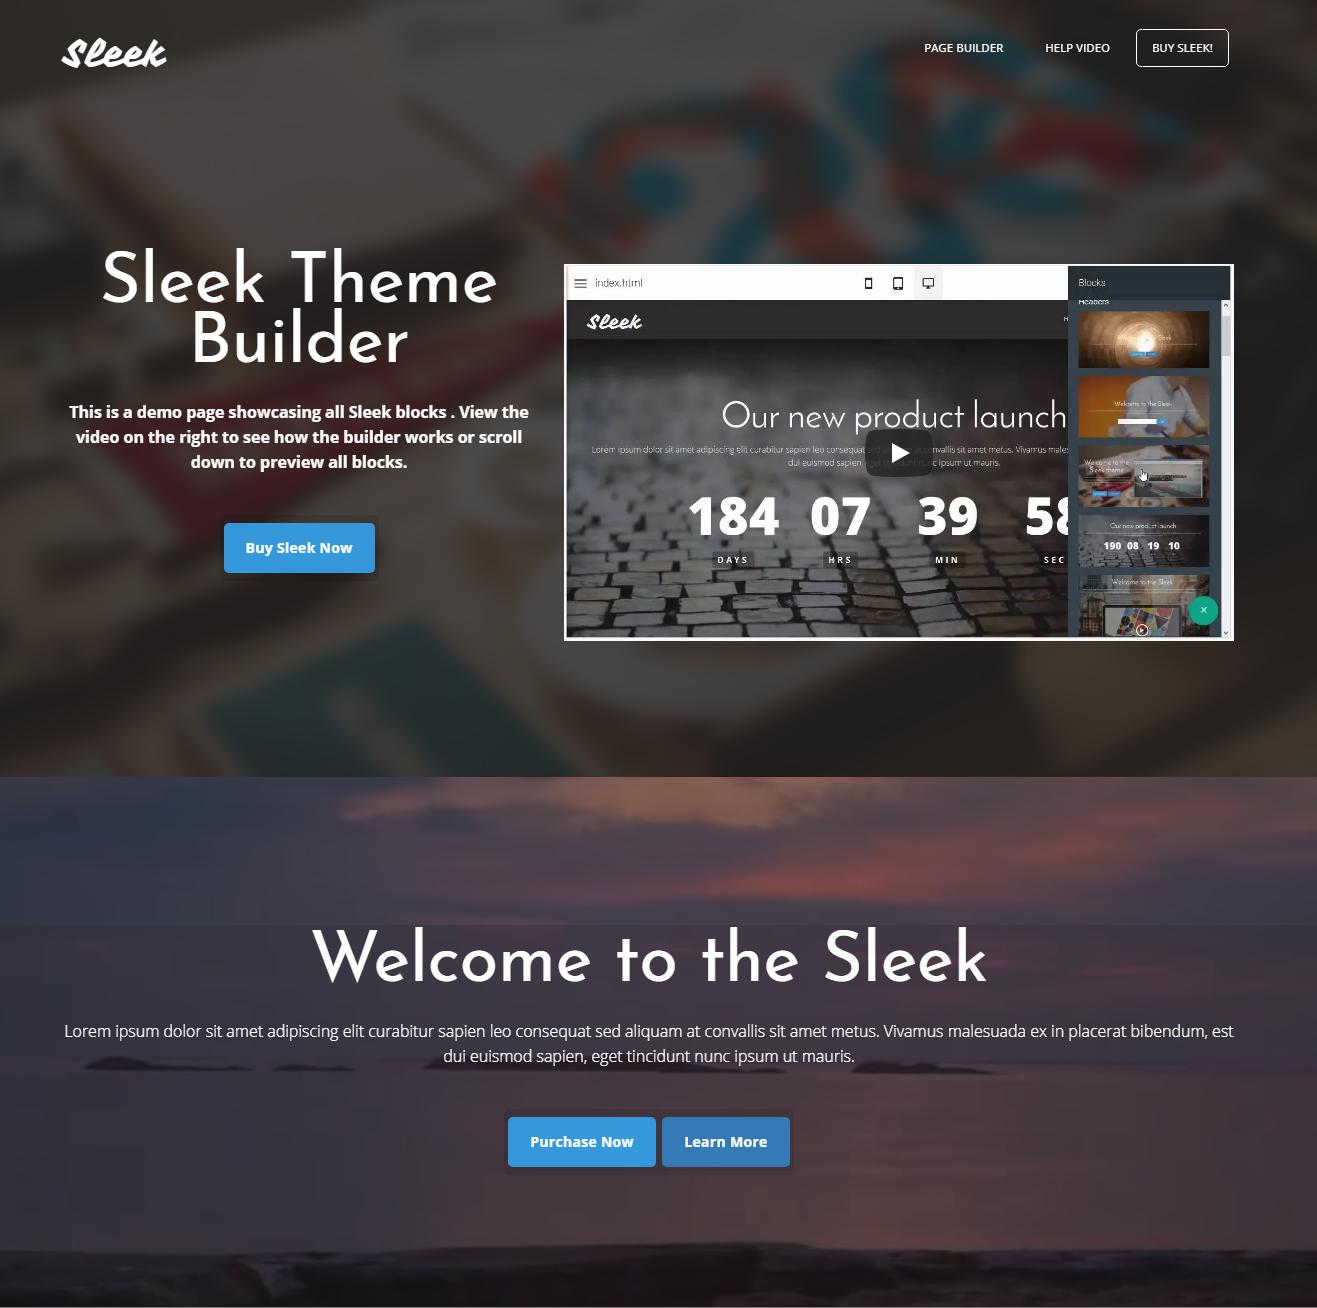 Sleek Theme Bootstrap Builder